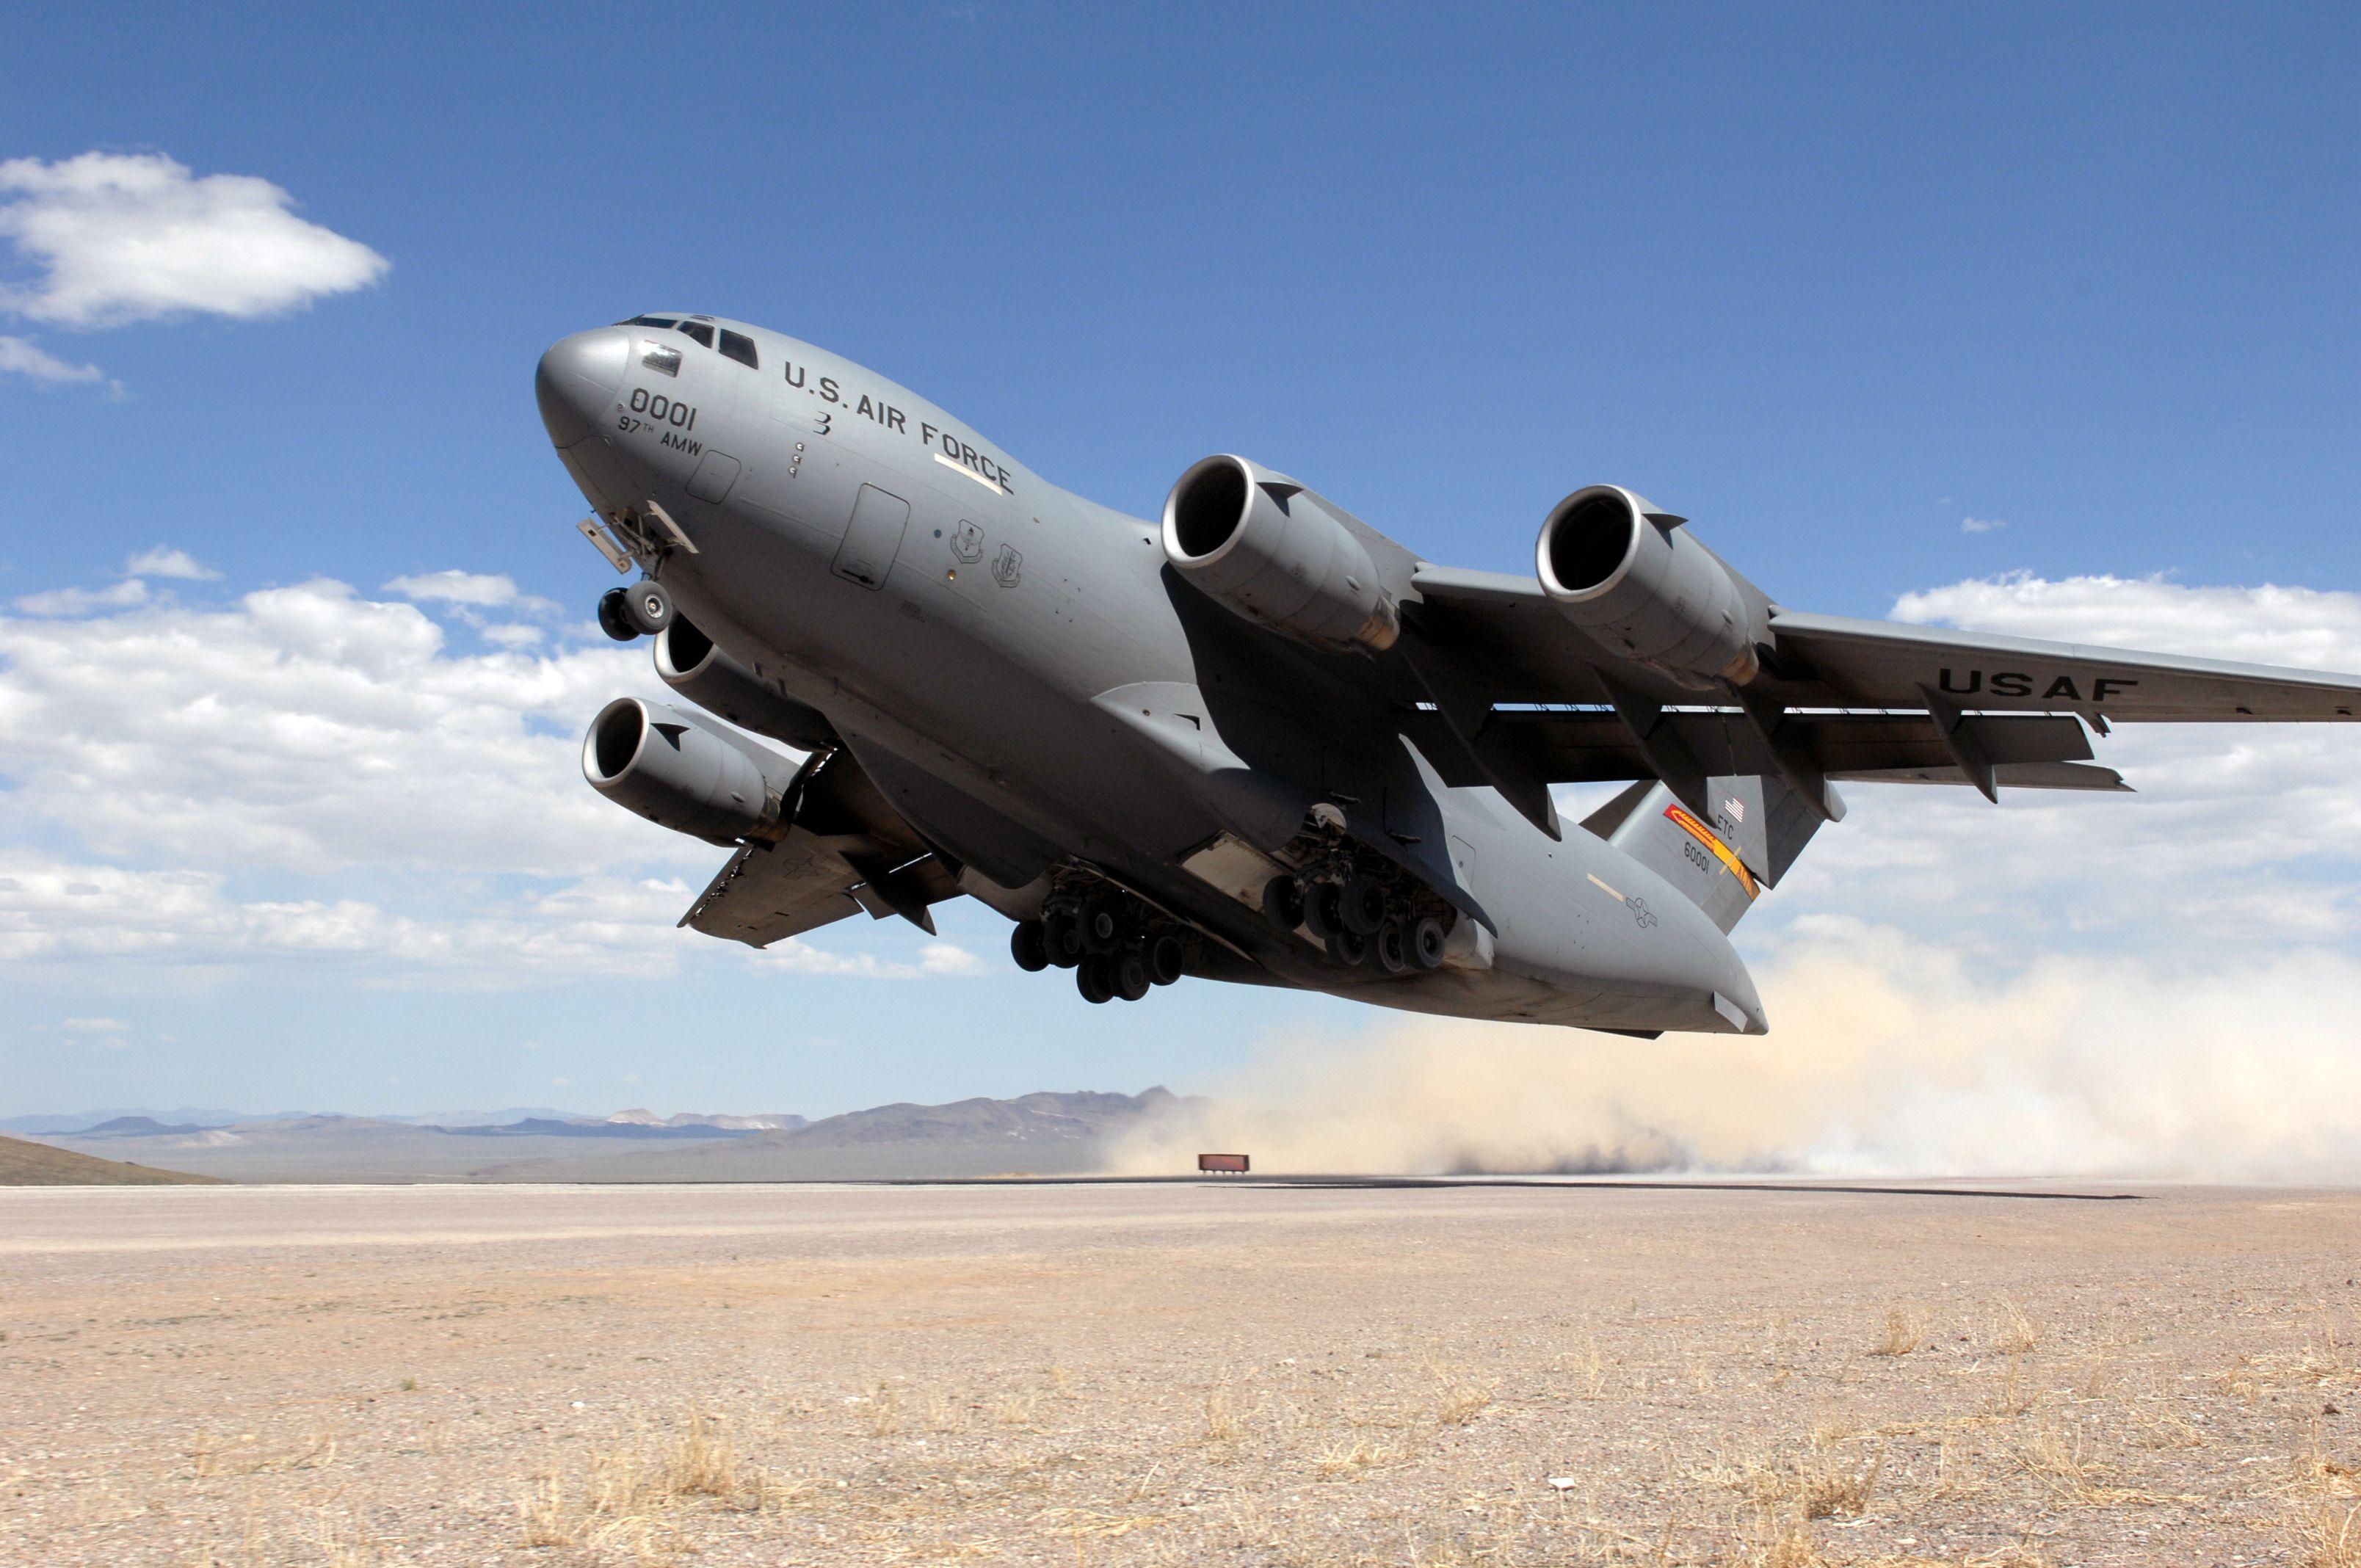 C-17 dusty takeoff